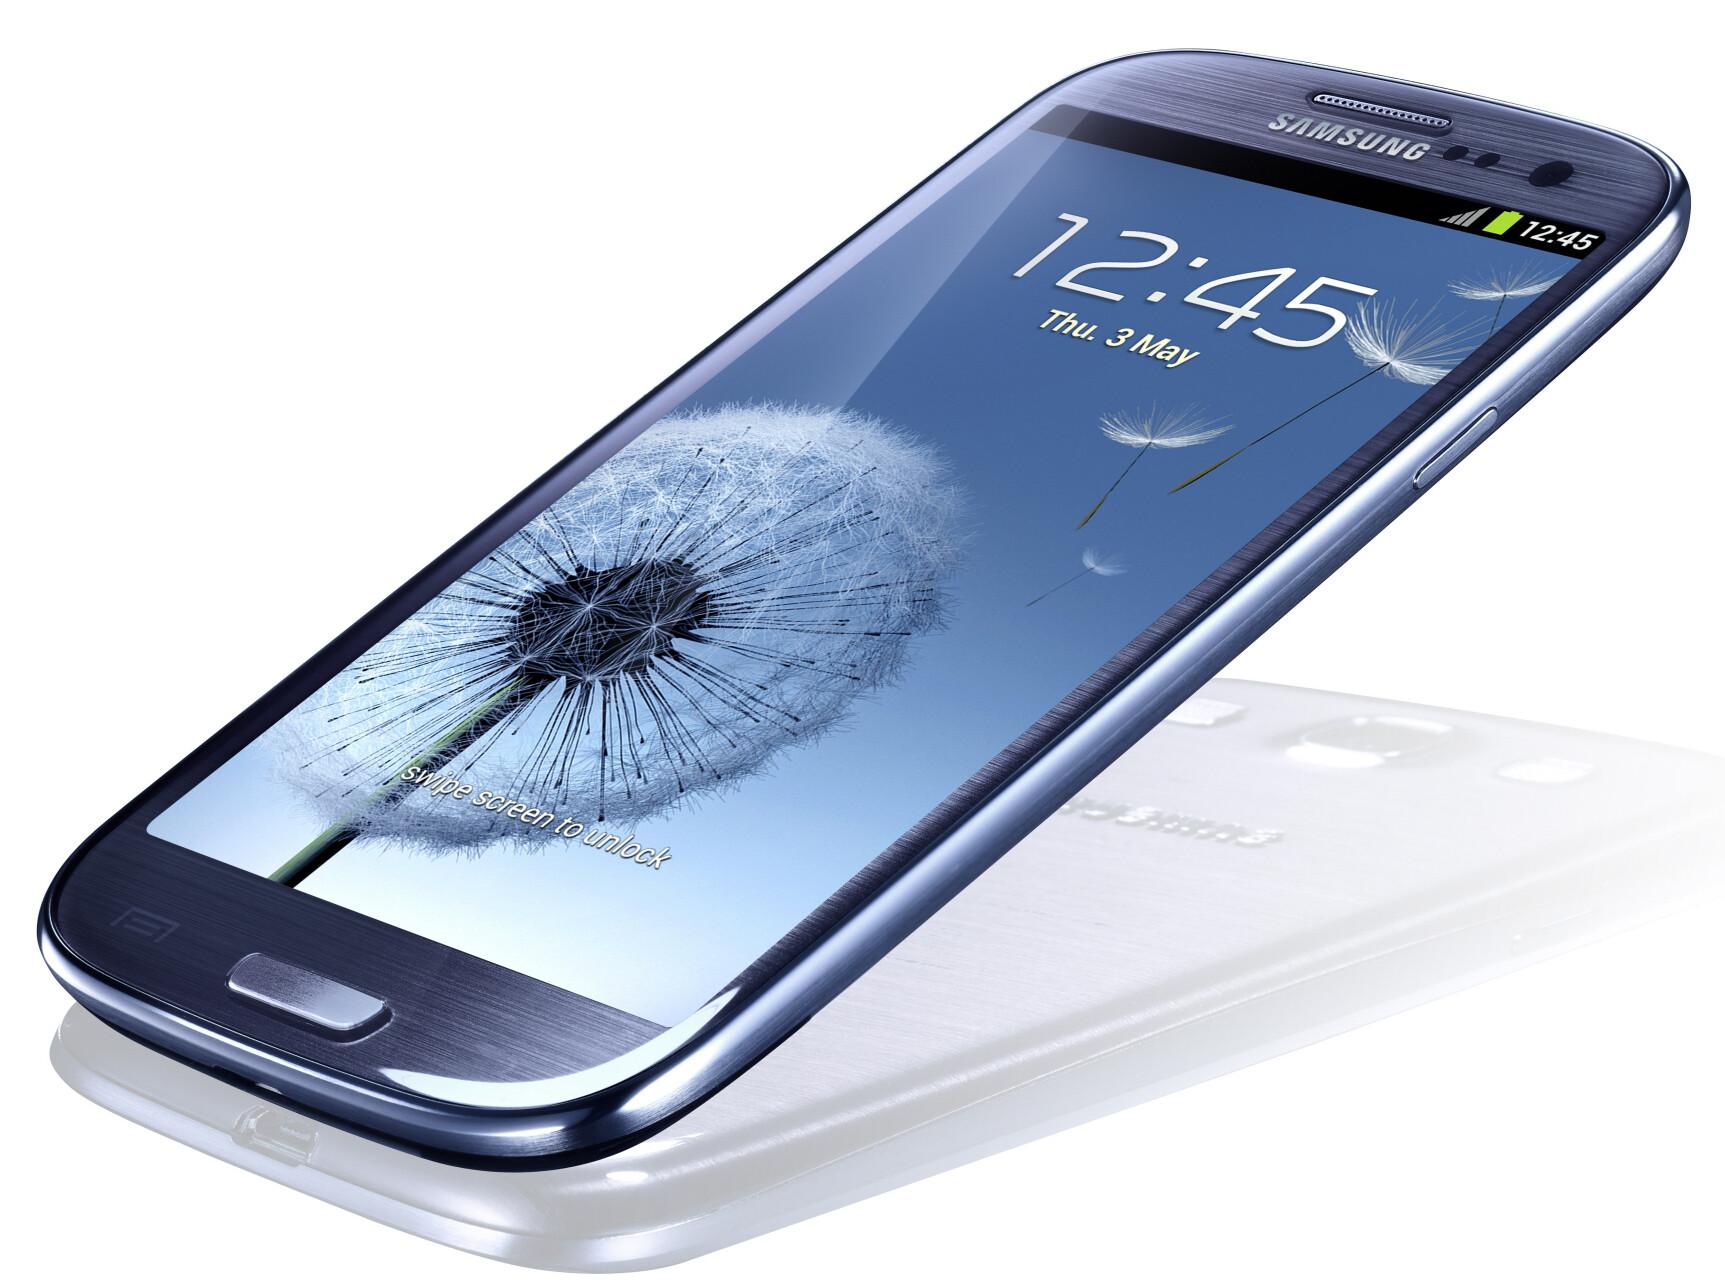 samsung galaxy s iii photos rh phonearena com Samsung Galaxy S3 Mini Manual Samsung Galaxy S3 Operators Manual